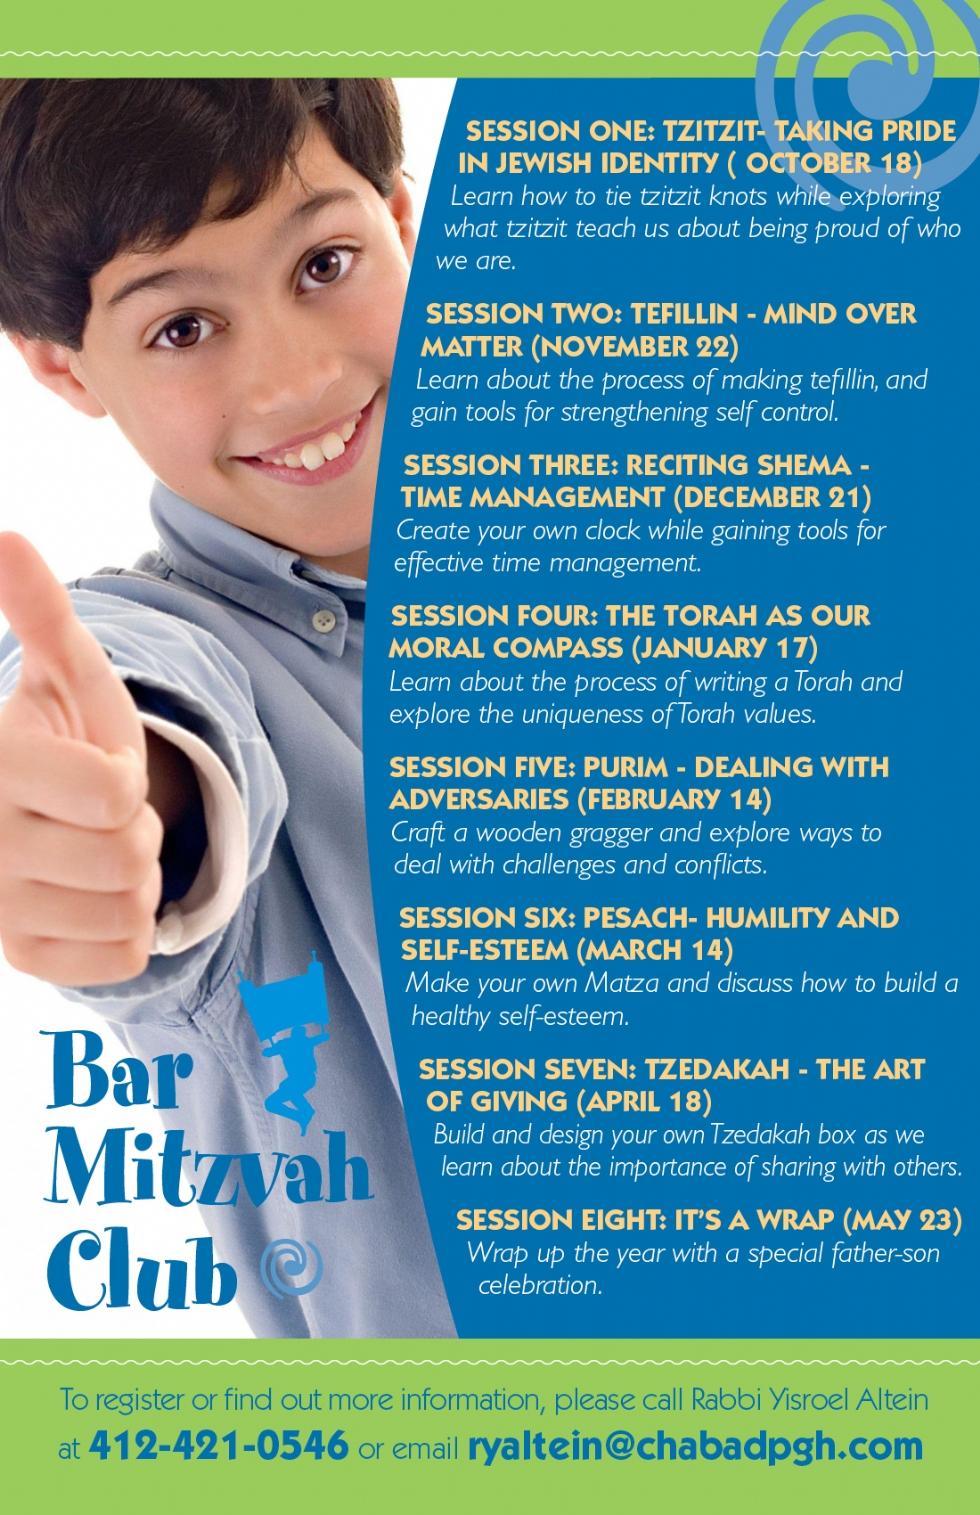 Bar Mitzvah202.jpg